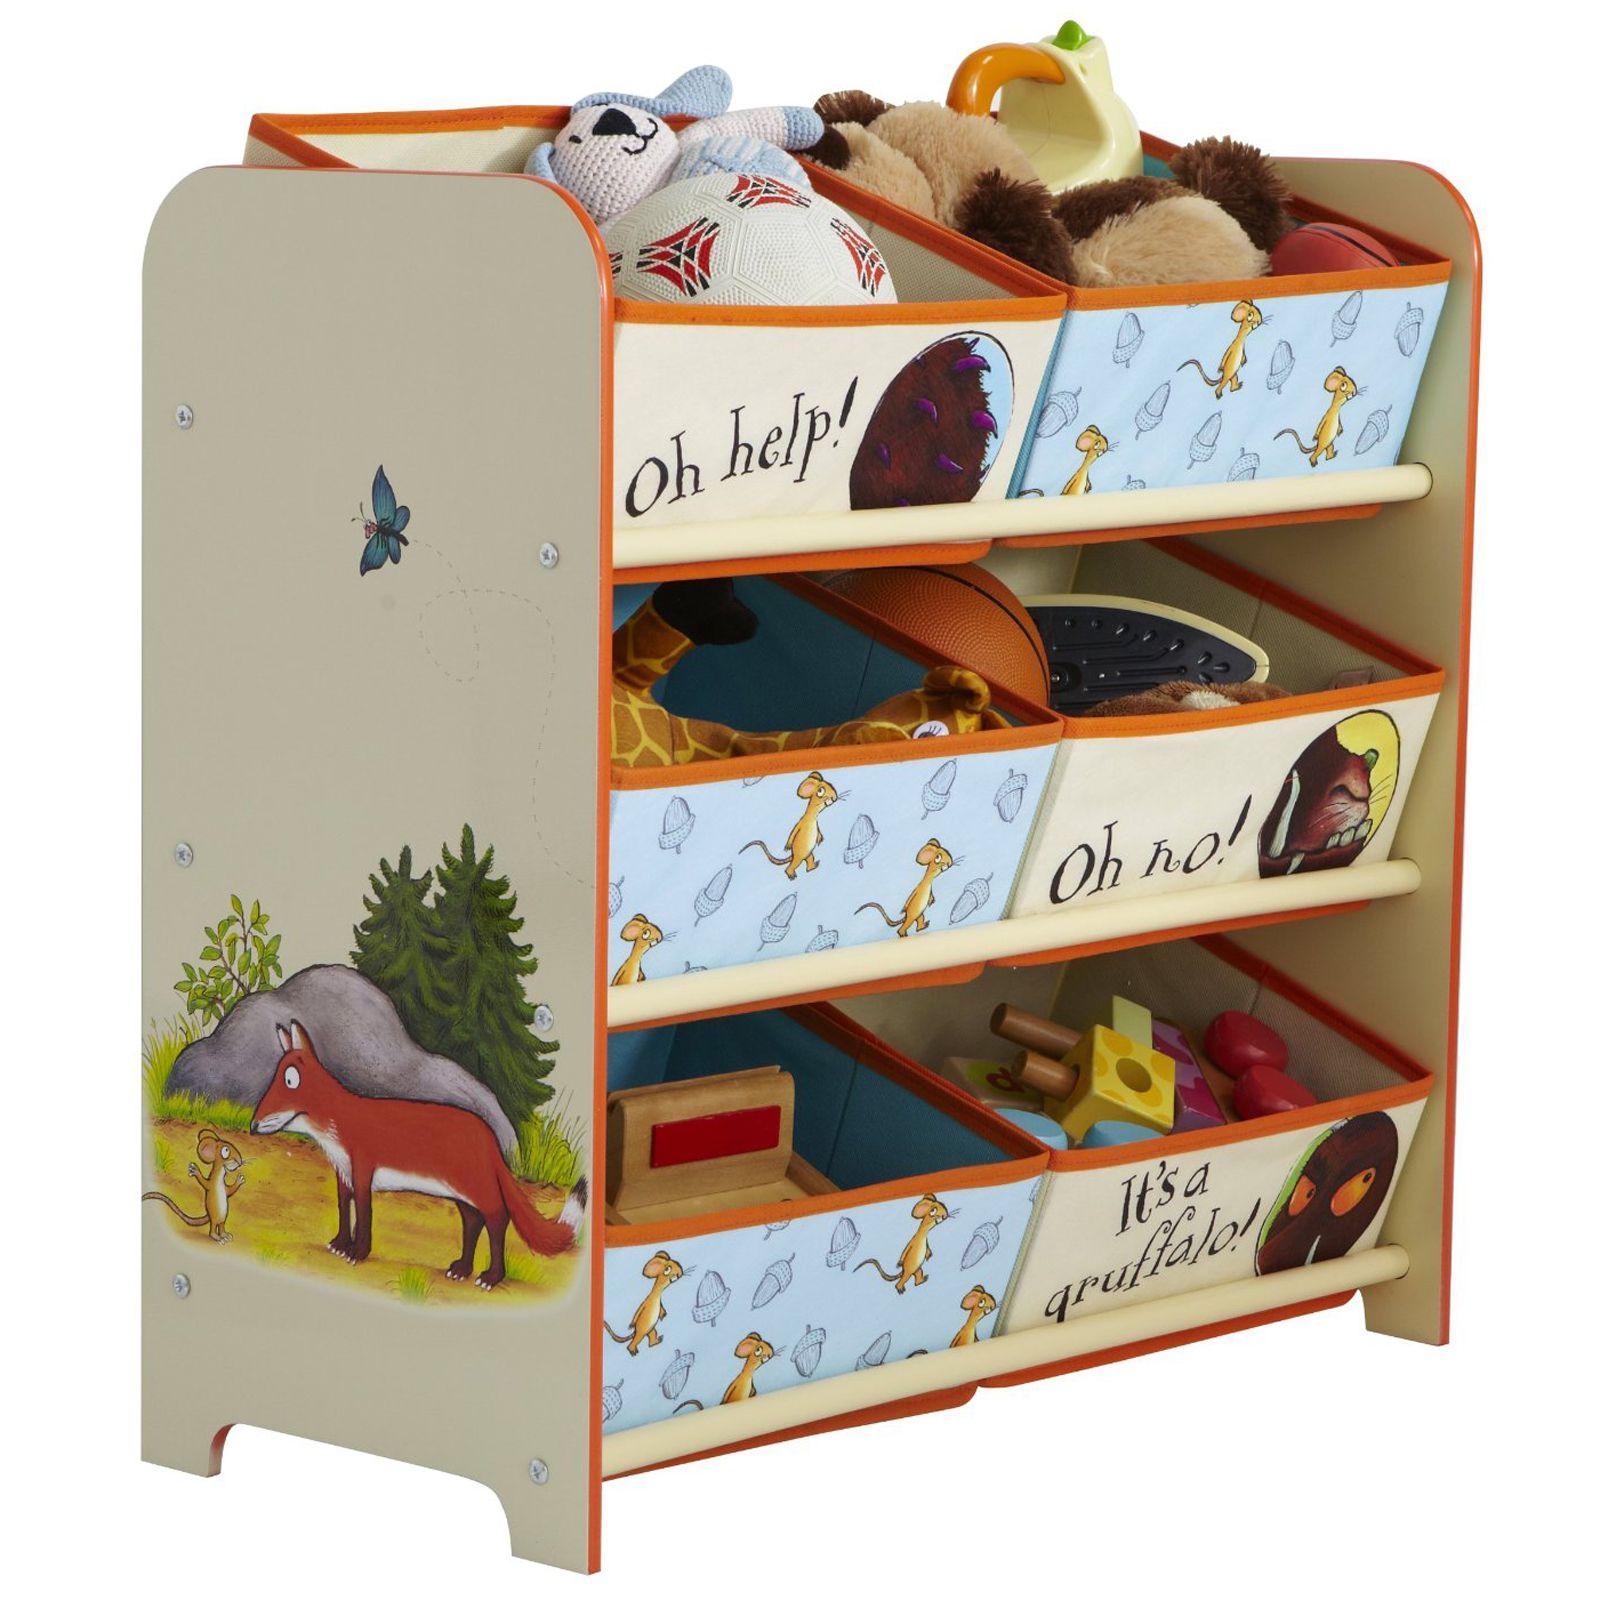 Gruffalo 6 bin storage unit new 100 official furniture ebay for Gruffalo fabric